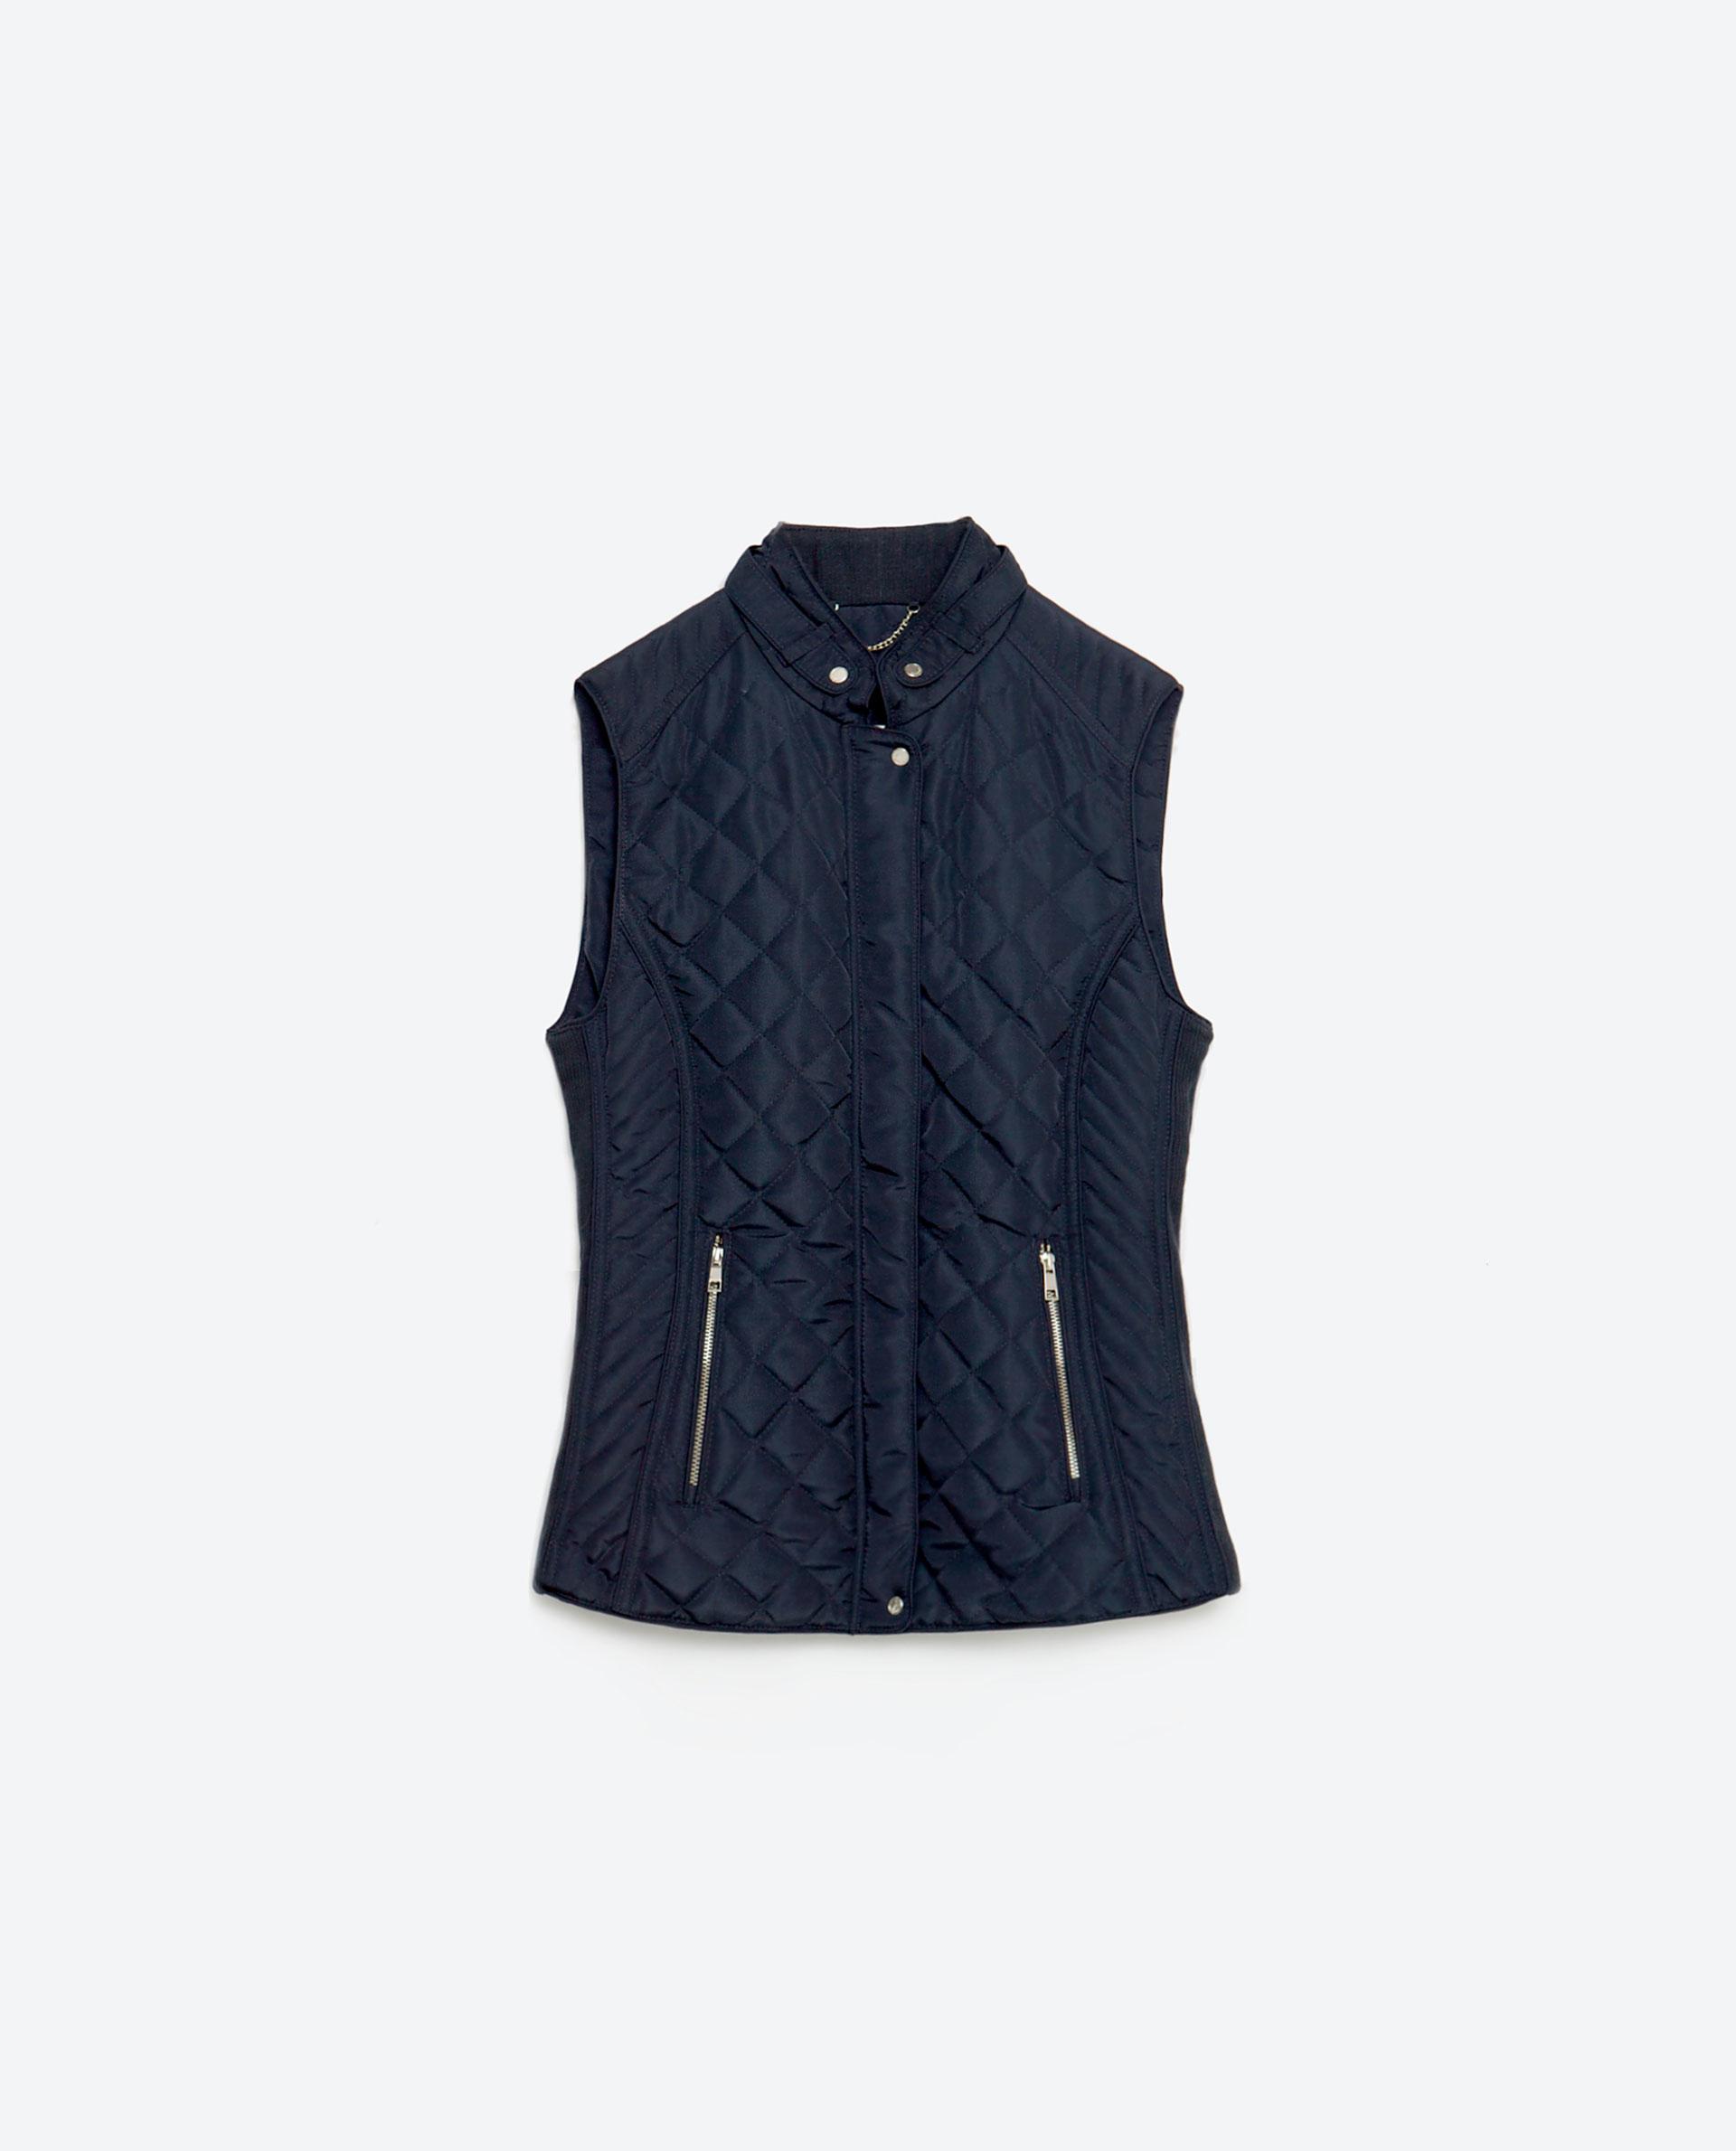 Zara Contrast Knit Waistcoat In Black Navy Blue Save